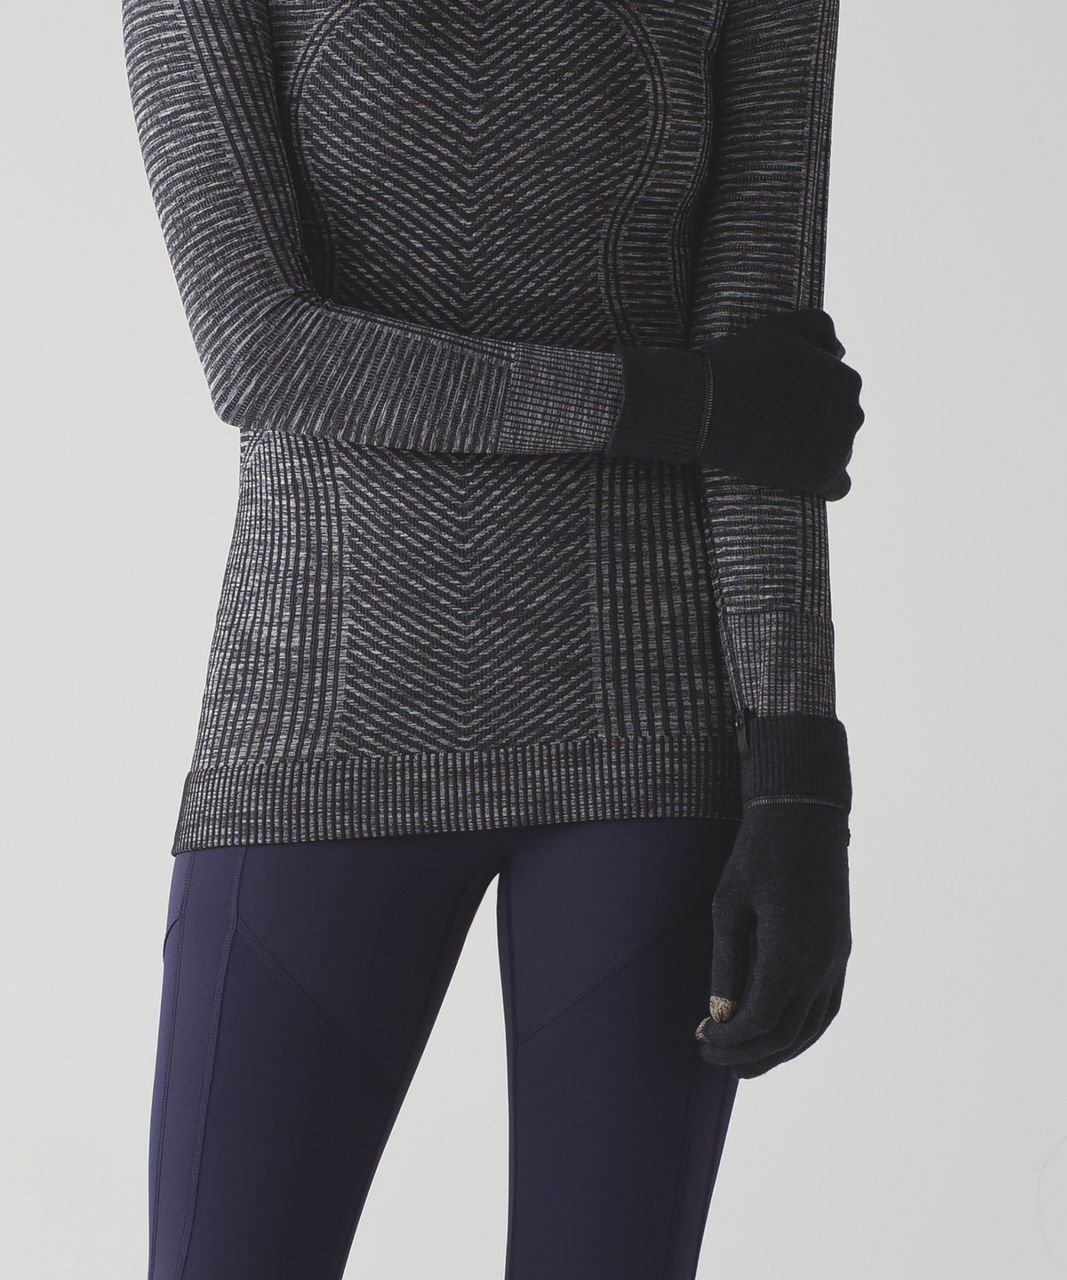 Lululemon Runderland Gloves - Heathered Black